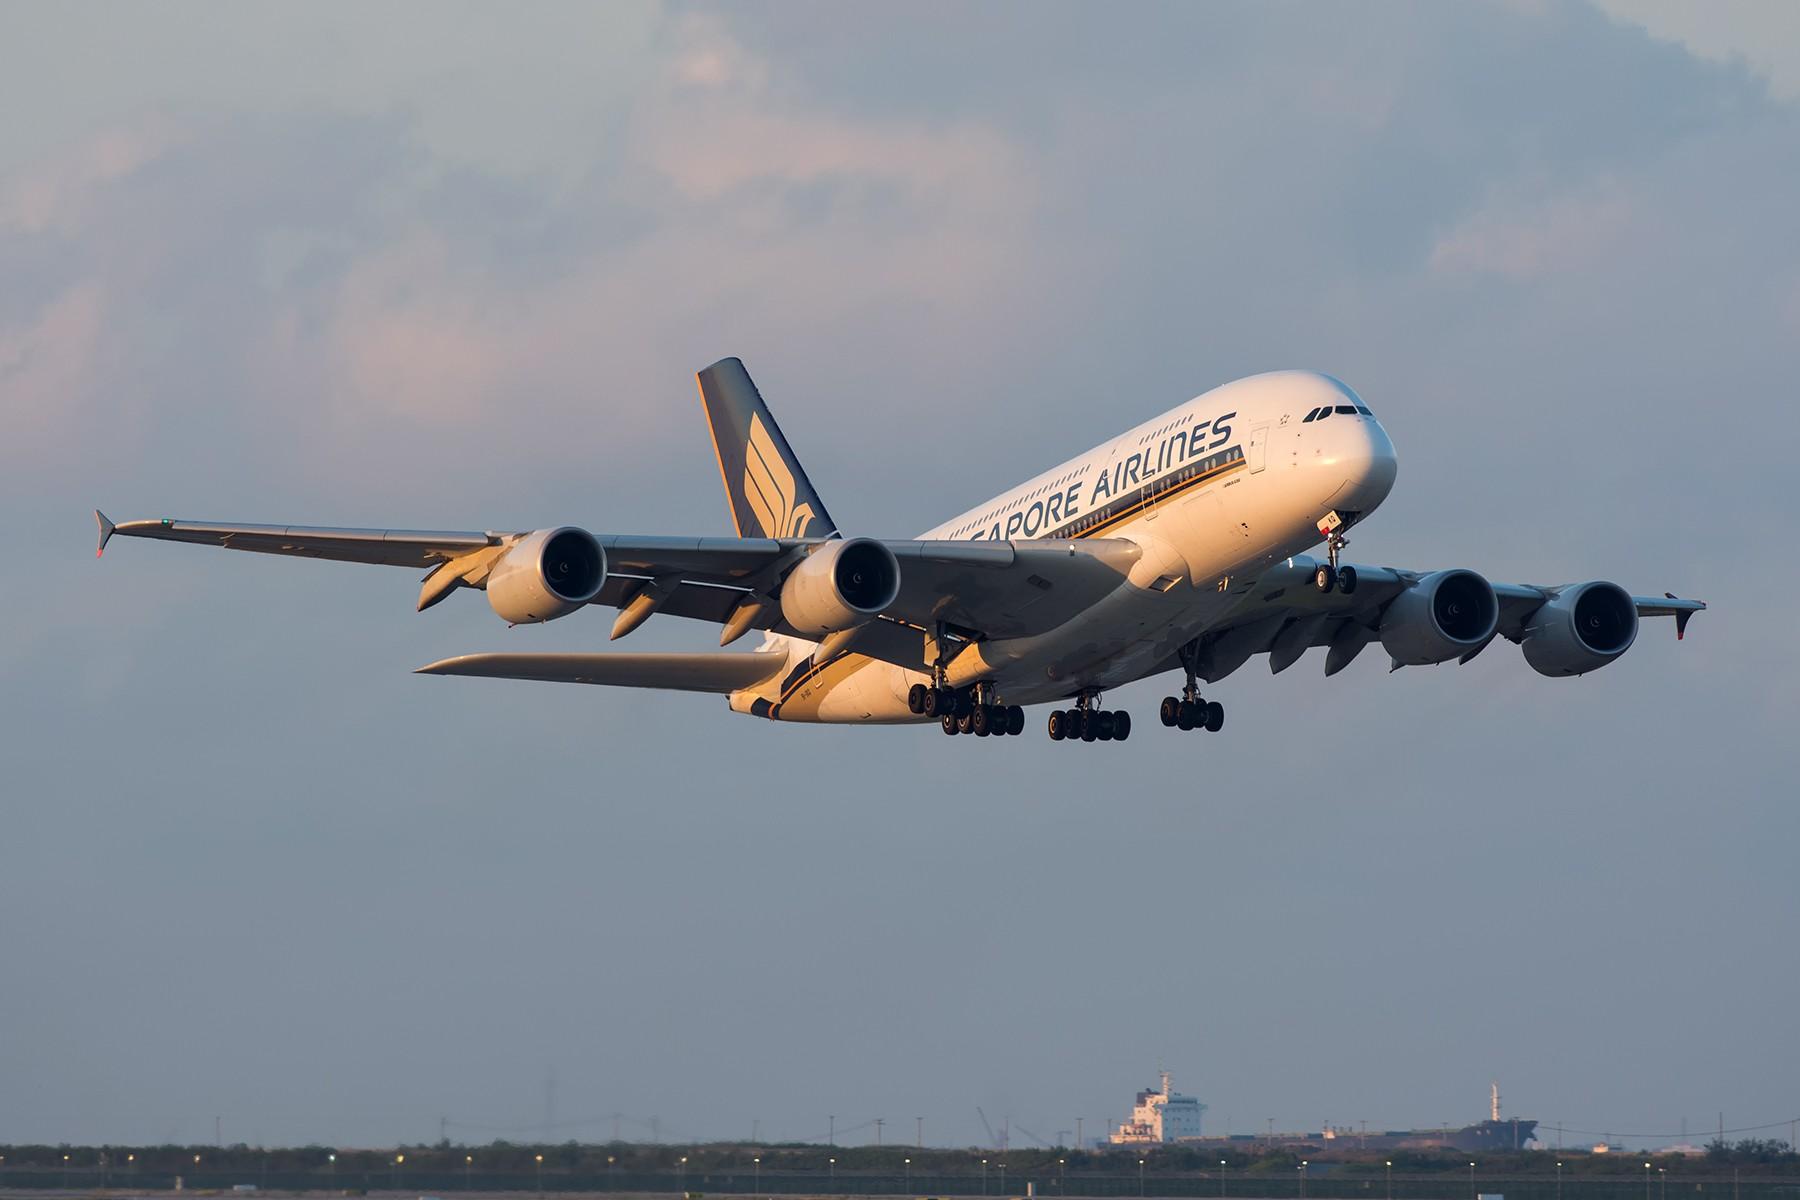 Re:[原创]【PVG】夕阳无限好,只是近黄昏 AIRBUS A380-800 9V-SKQ 中国上海浦东国际机场